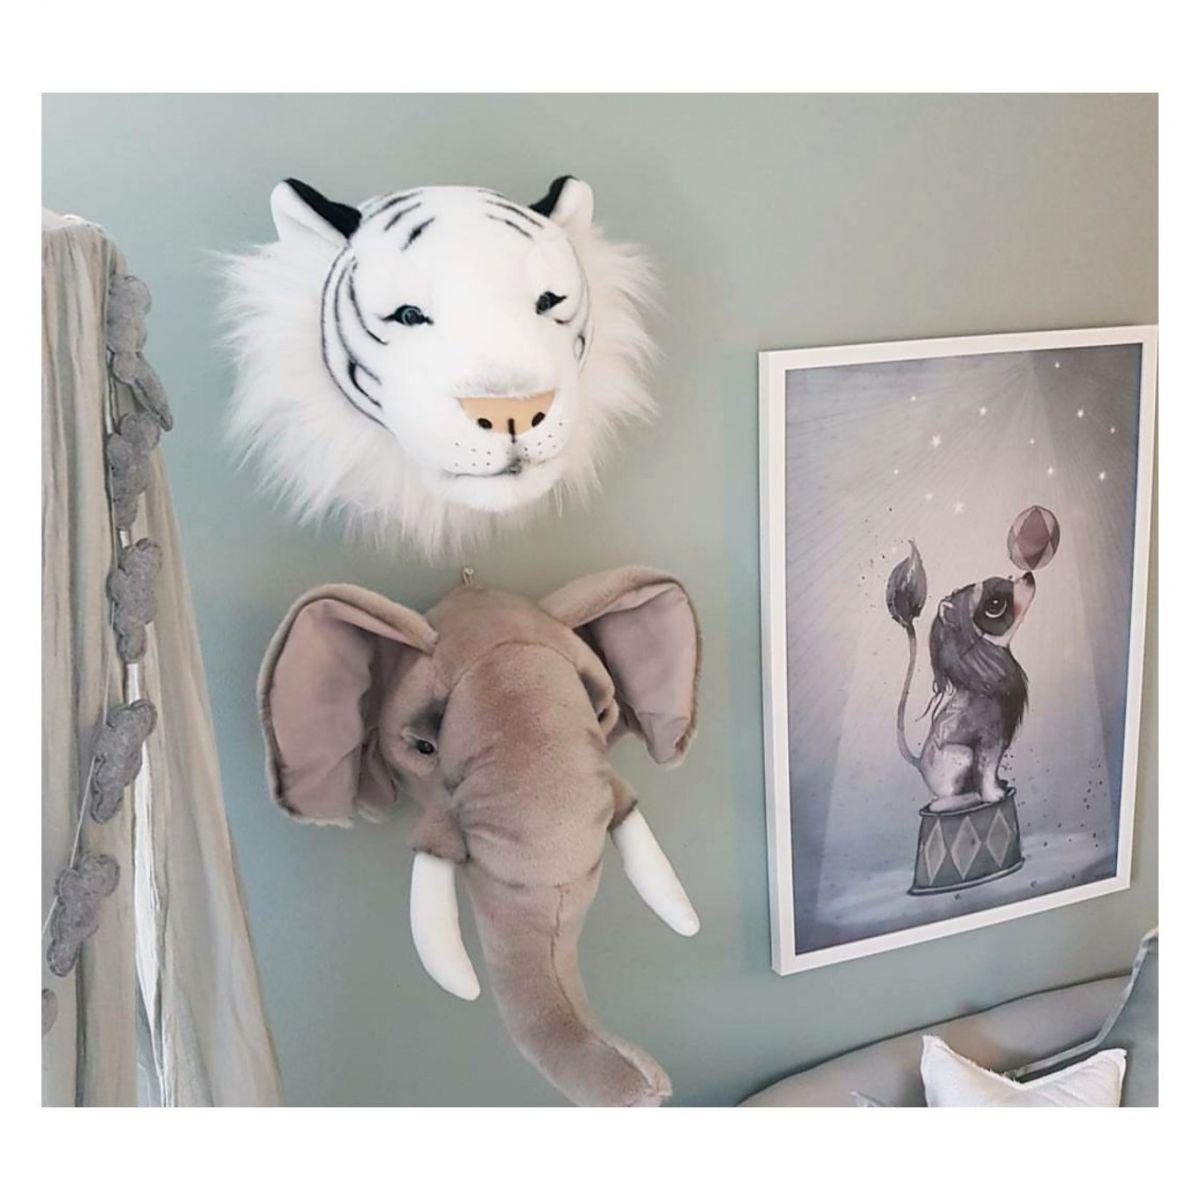 Pelúcia de Parede - Cabeça de Tigre Branco